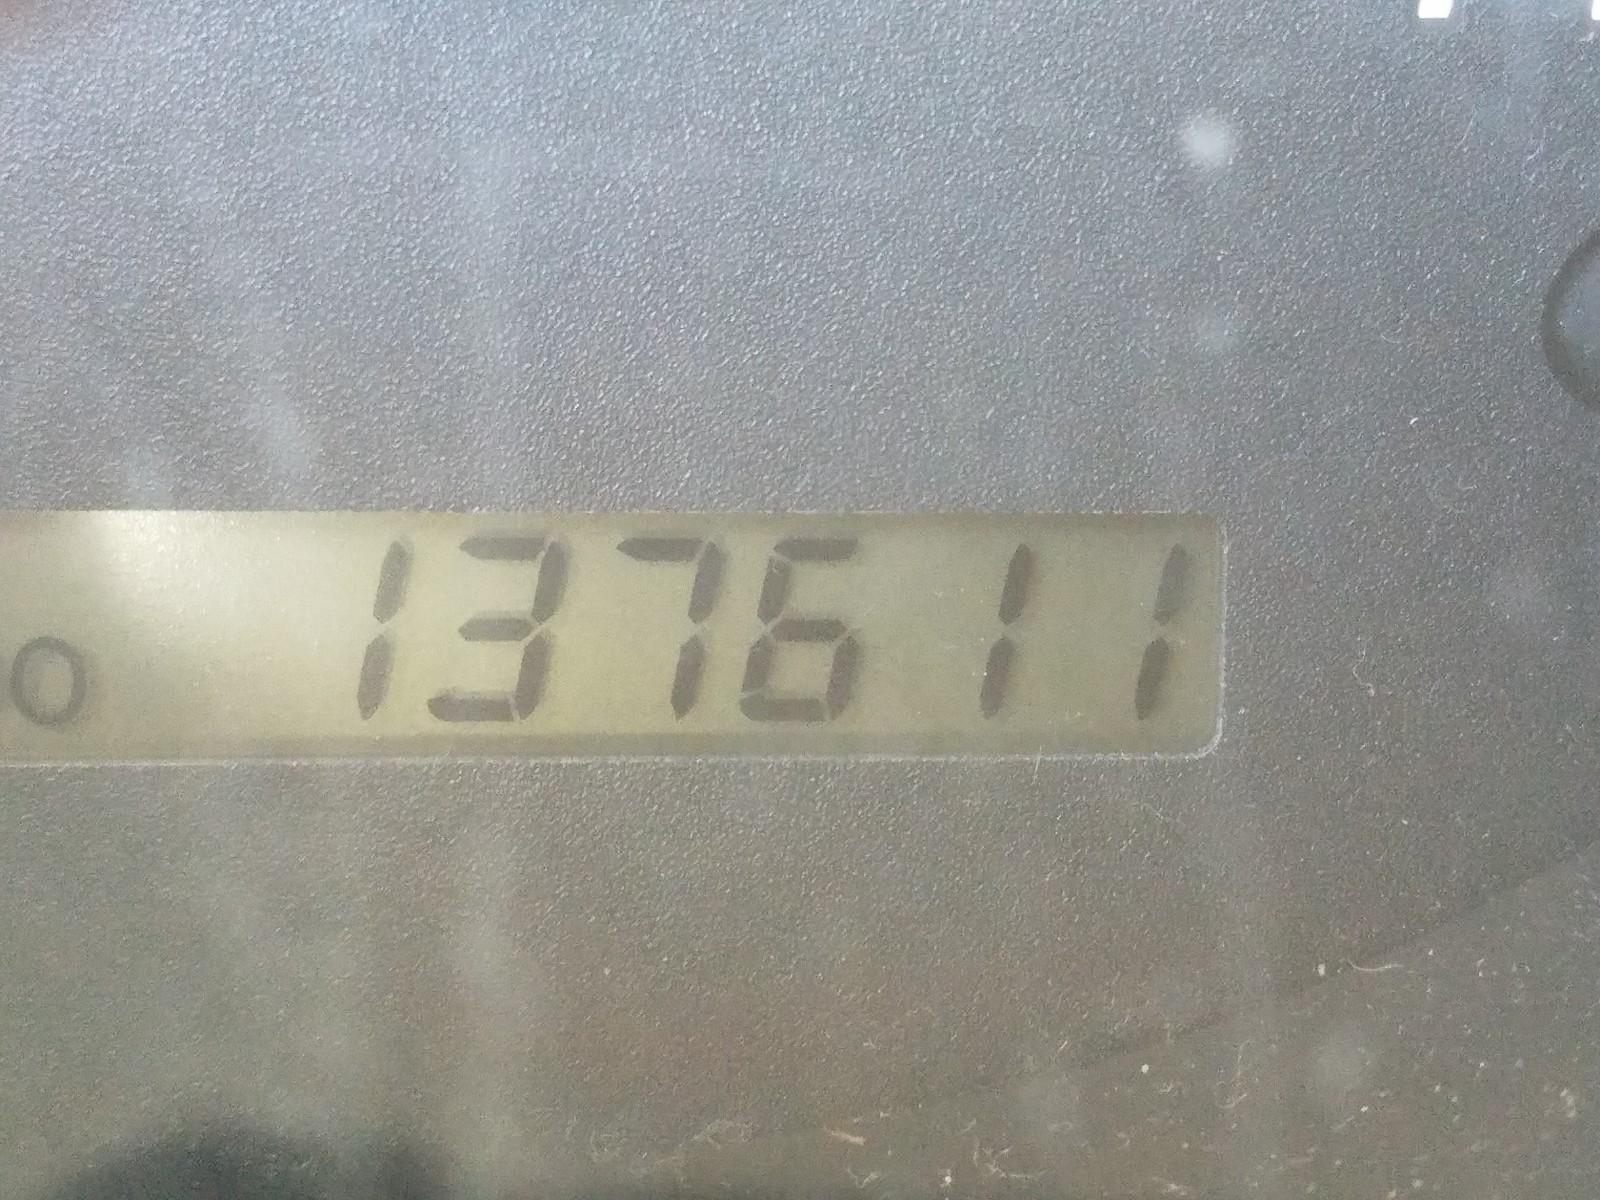 JTEGD21A060132850 - 2006 Toyota Highlander 2.4L front view